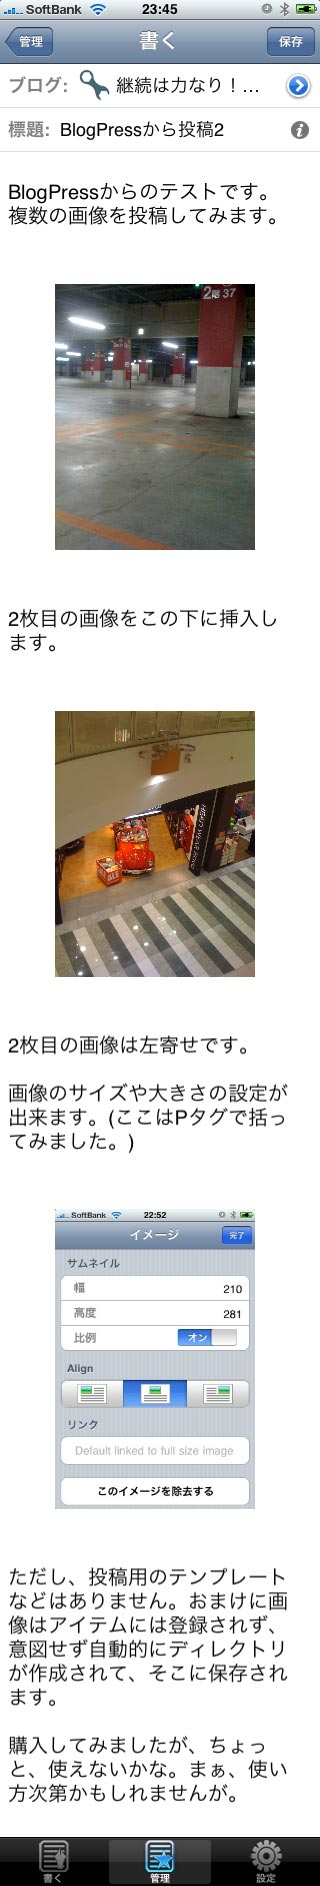 100214_blogpress02.jpg